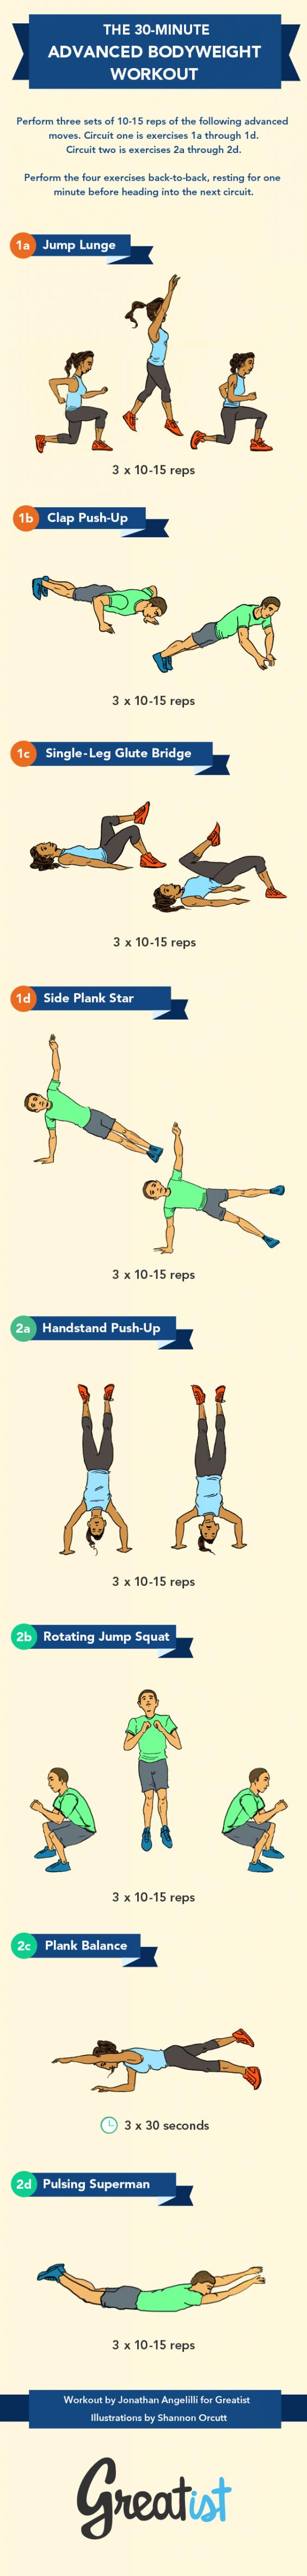 30-Minute Advanced Bodyweight Workout